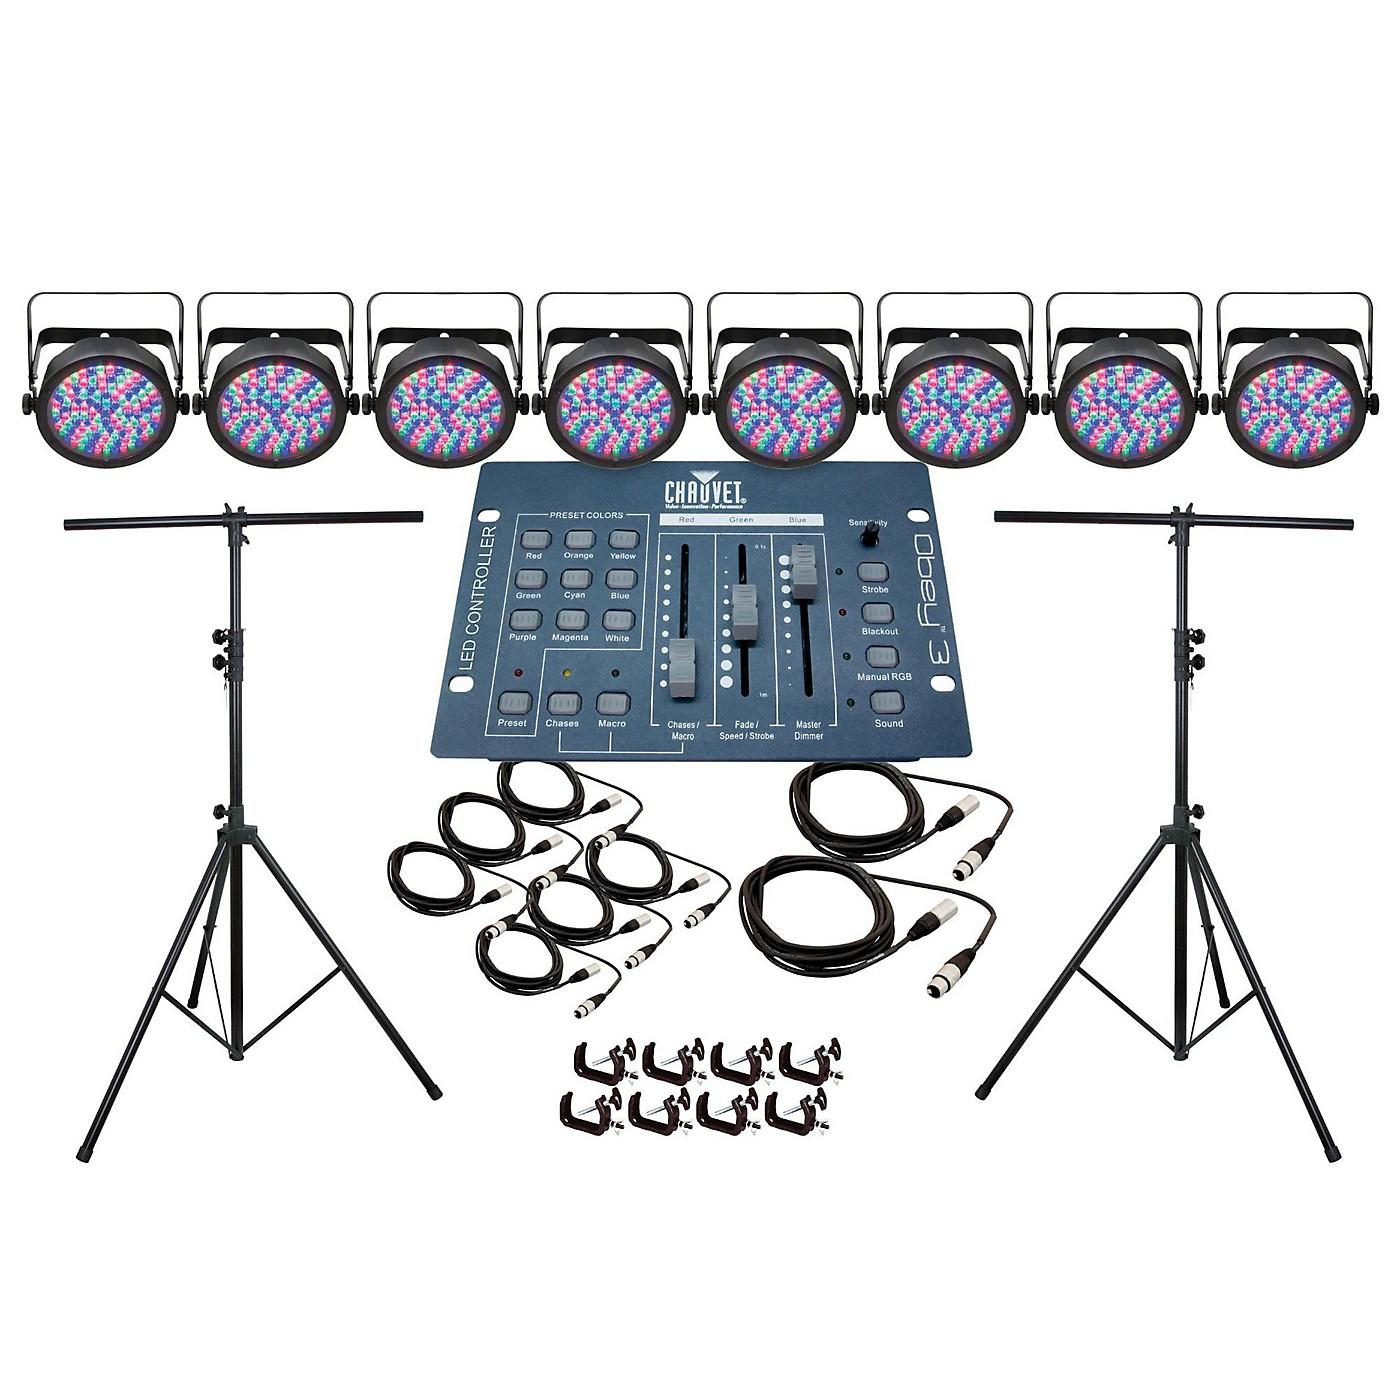 CHAUVET DJ Par 56 8 Light System thumbnail